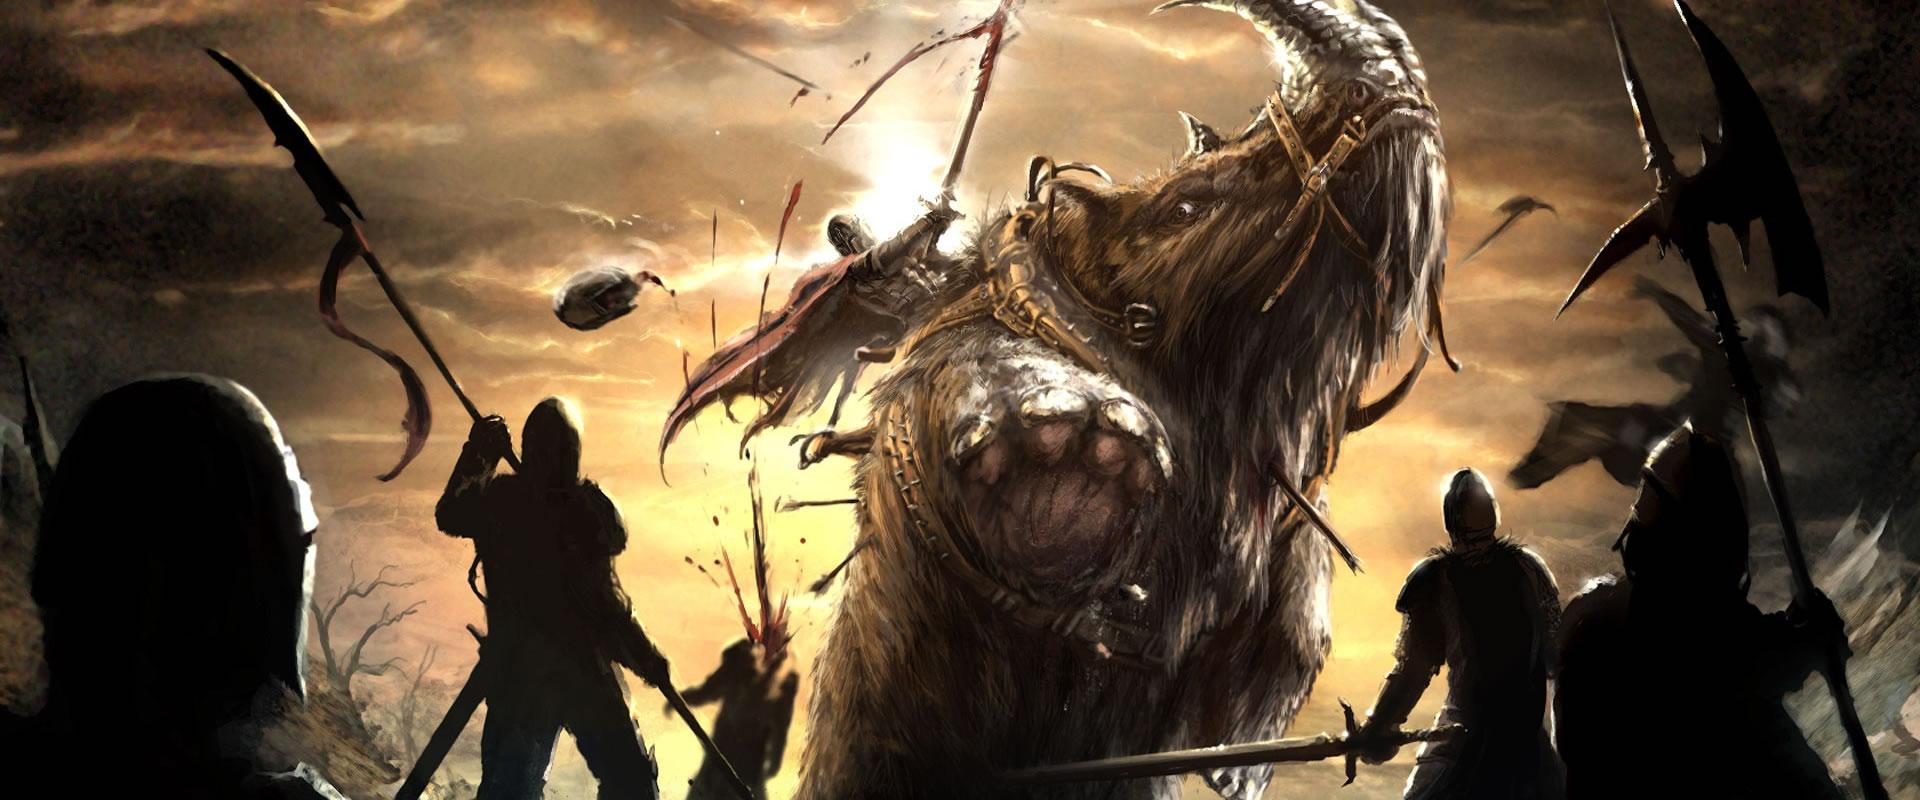 Mortal Online: Mortal Online. Sarducca!